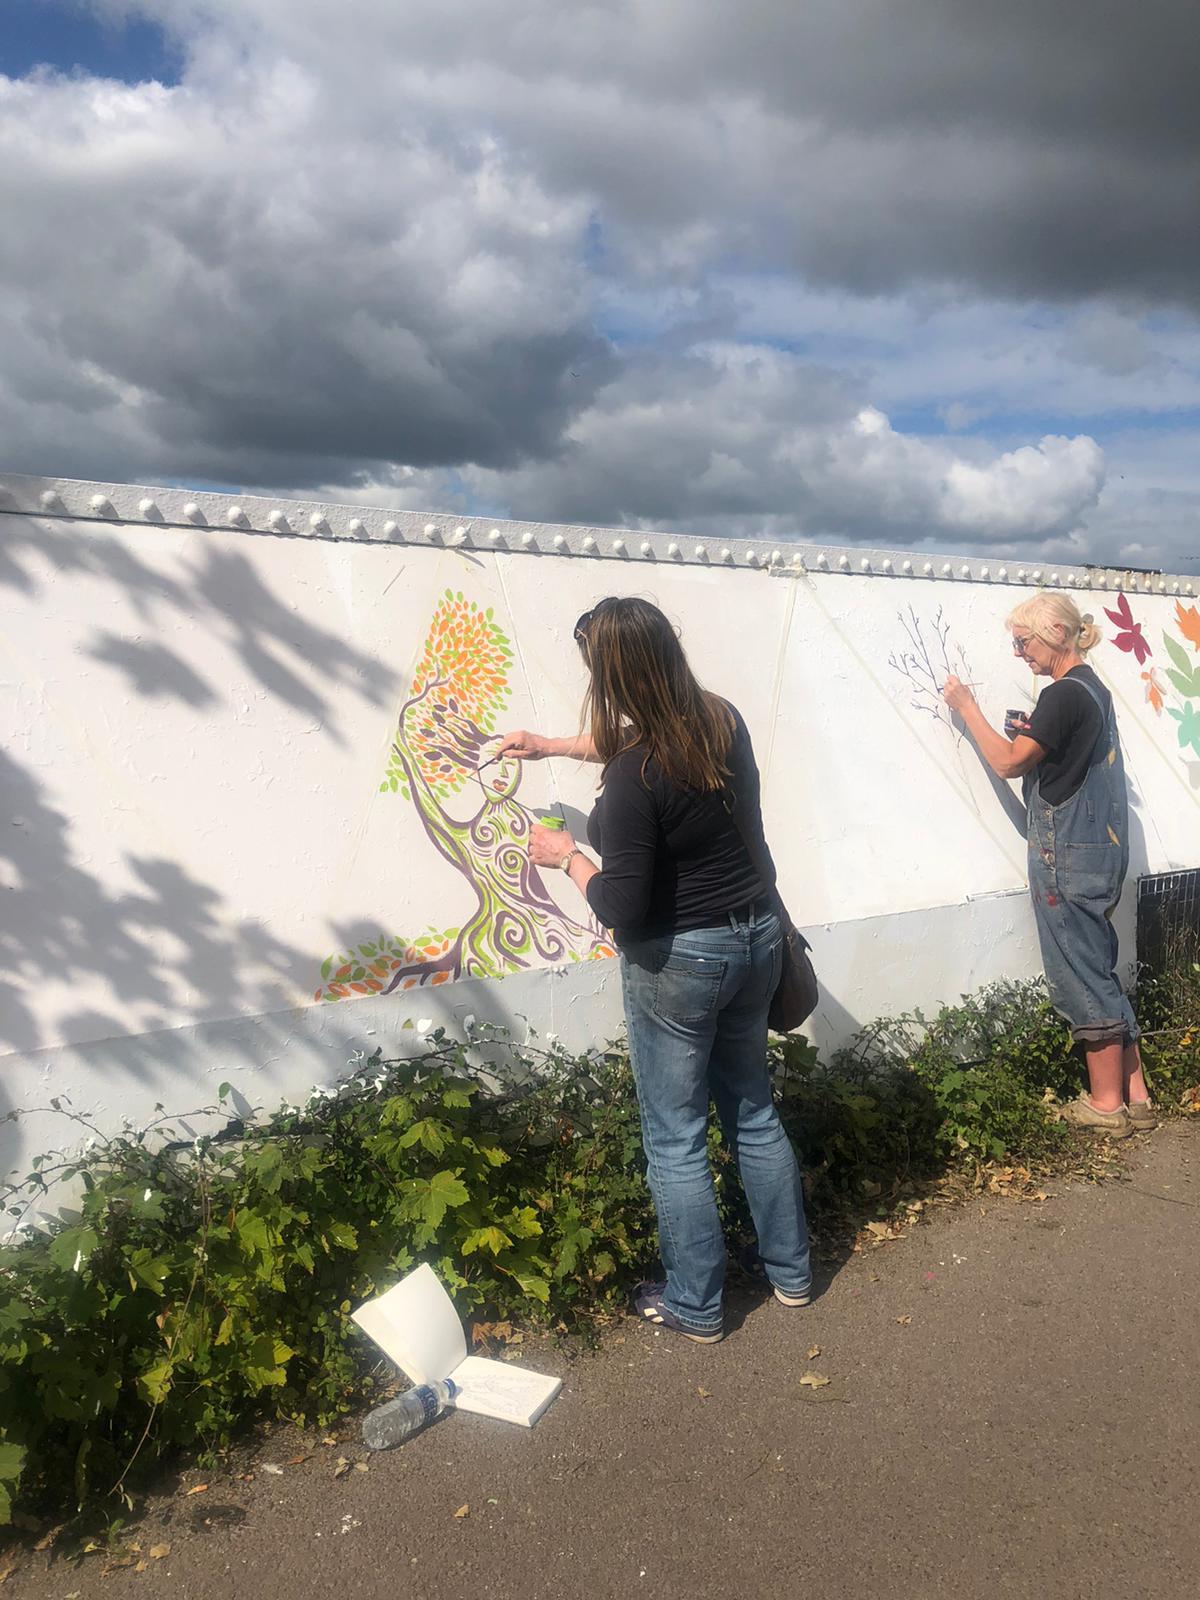 Cheltenham Paint Festival, People Painting